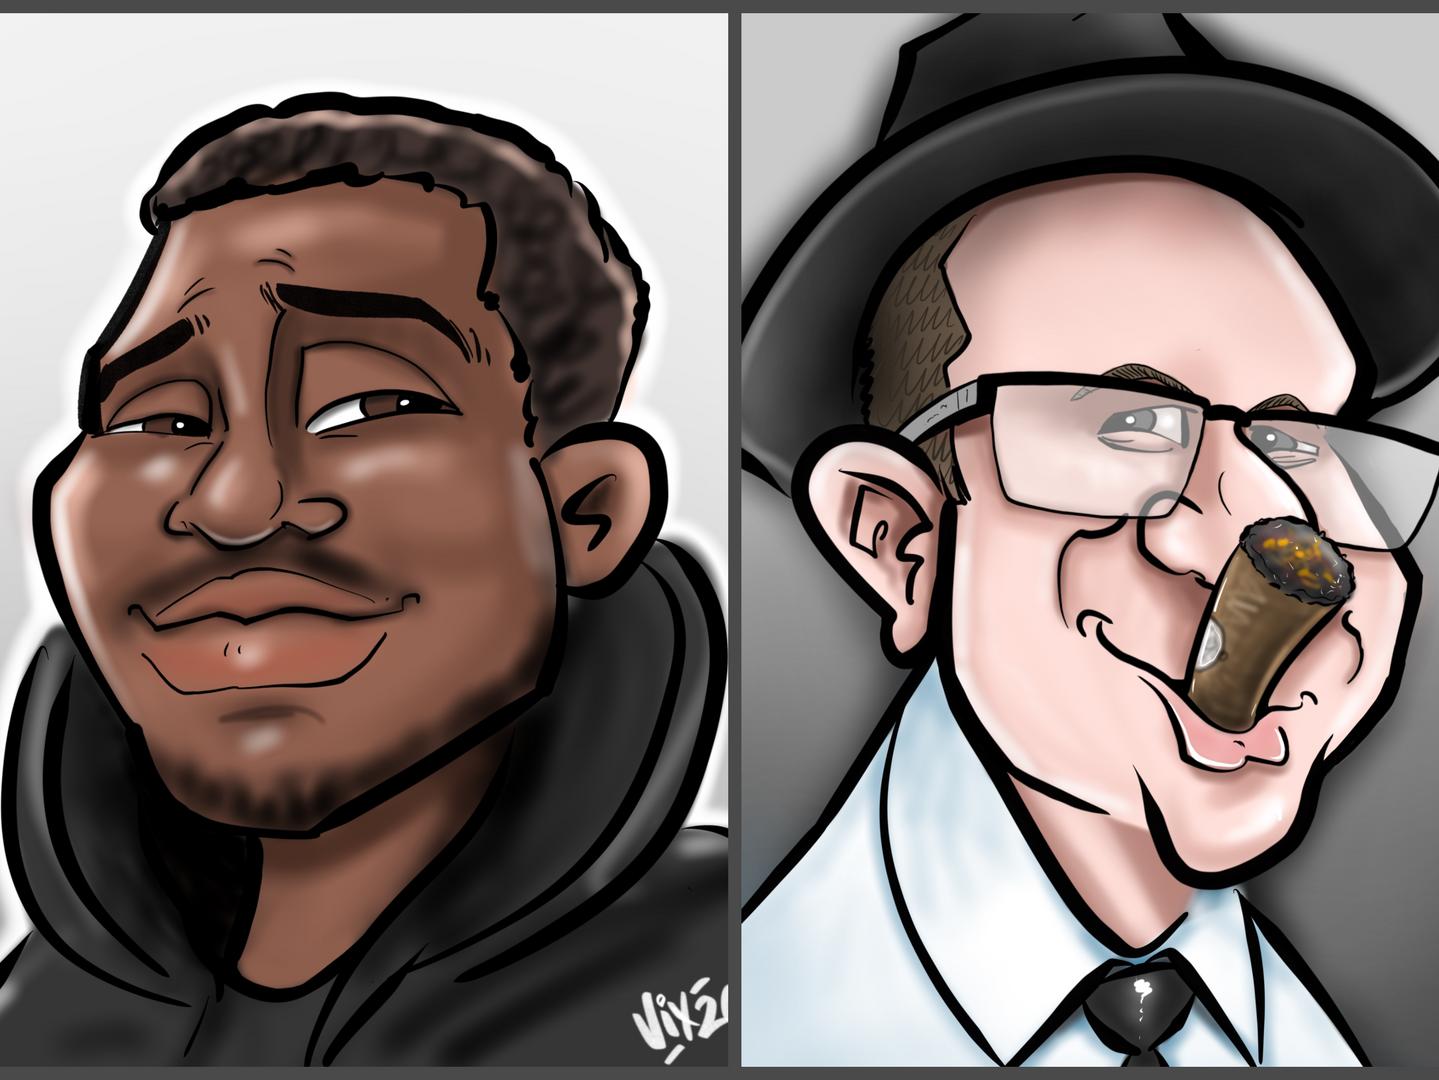 vix_caricatures (10).png